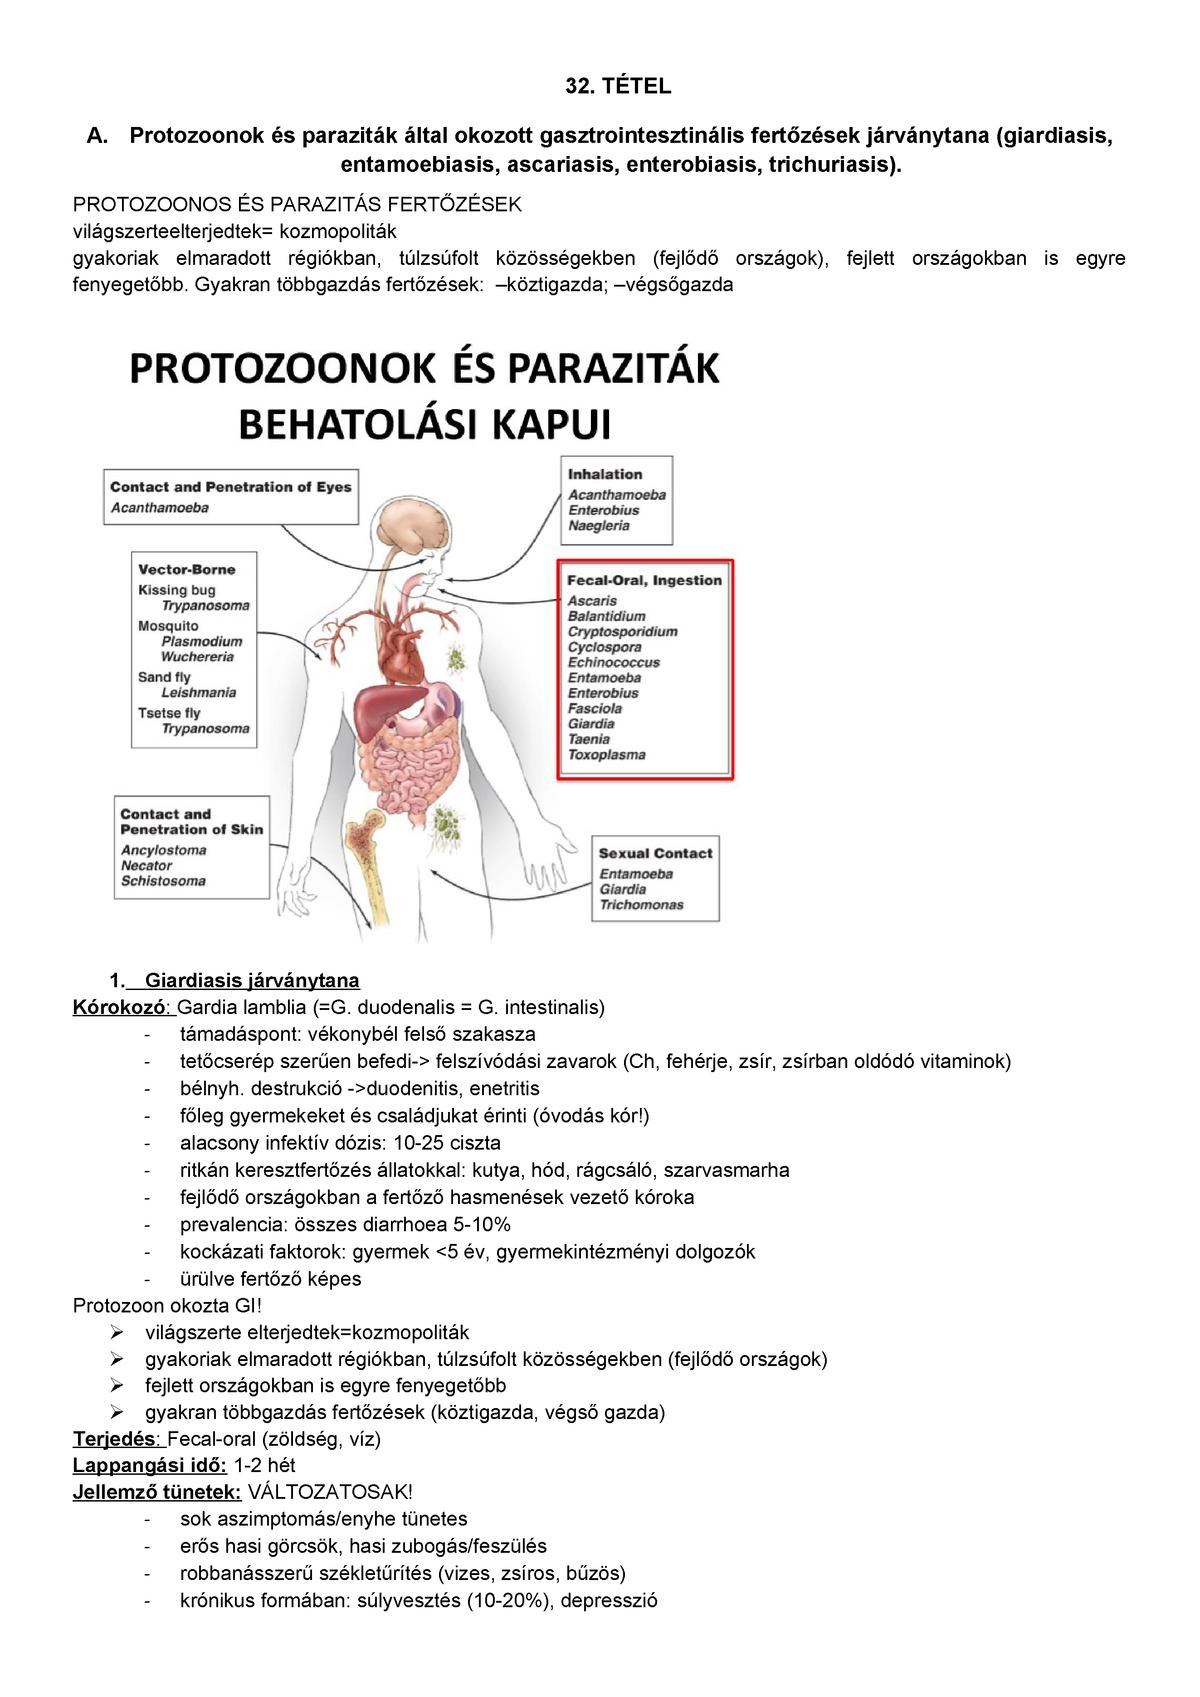 hasi fájdalom enterobiasissal)